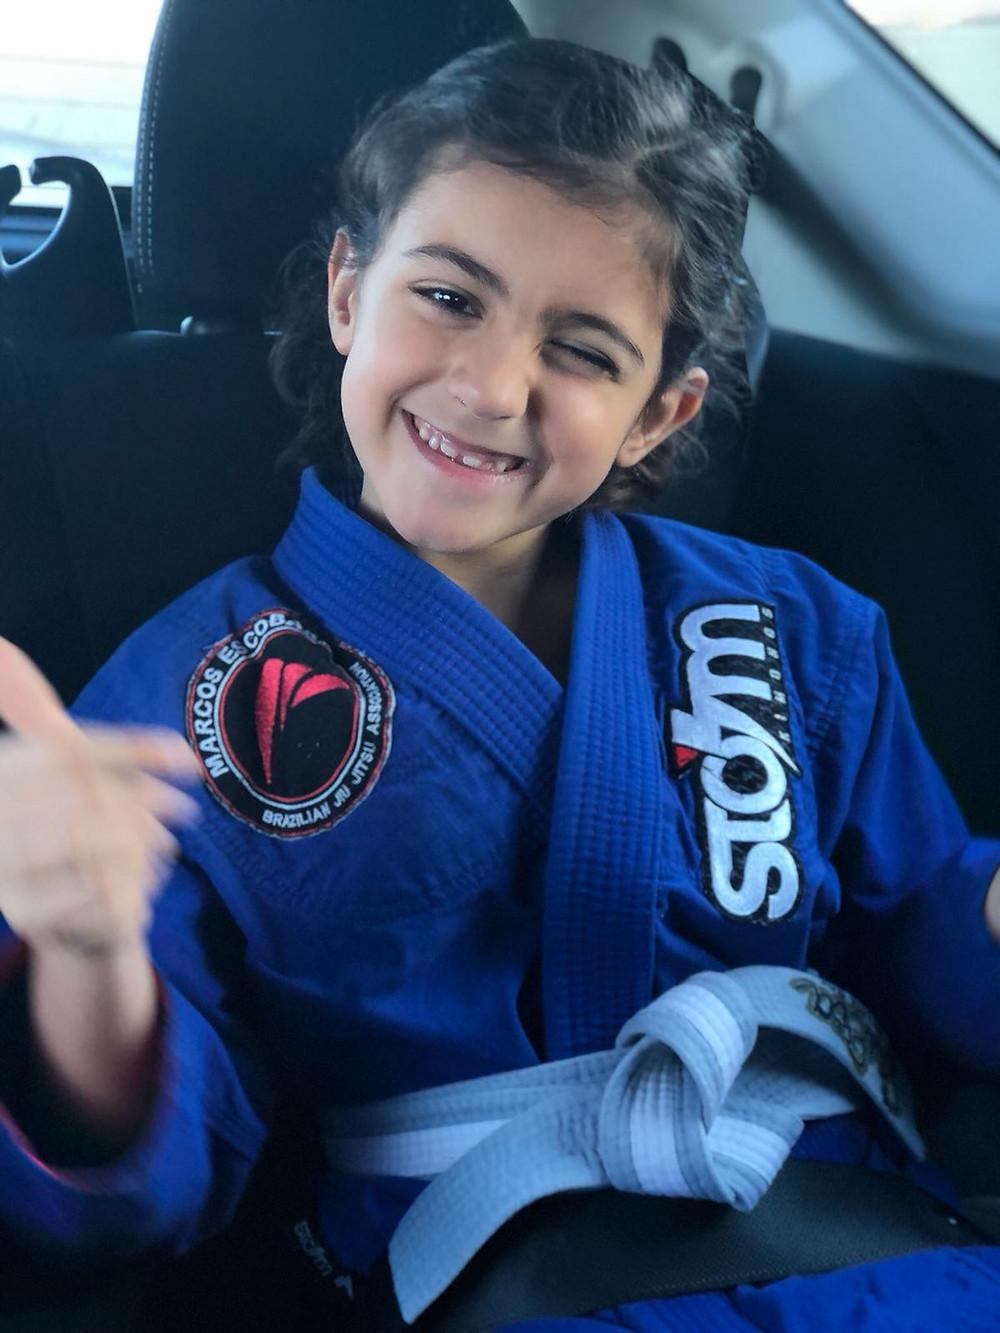 Kids Jiu-Jitsu and Self-Defense